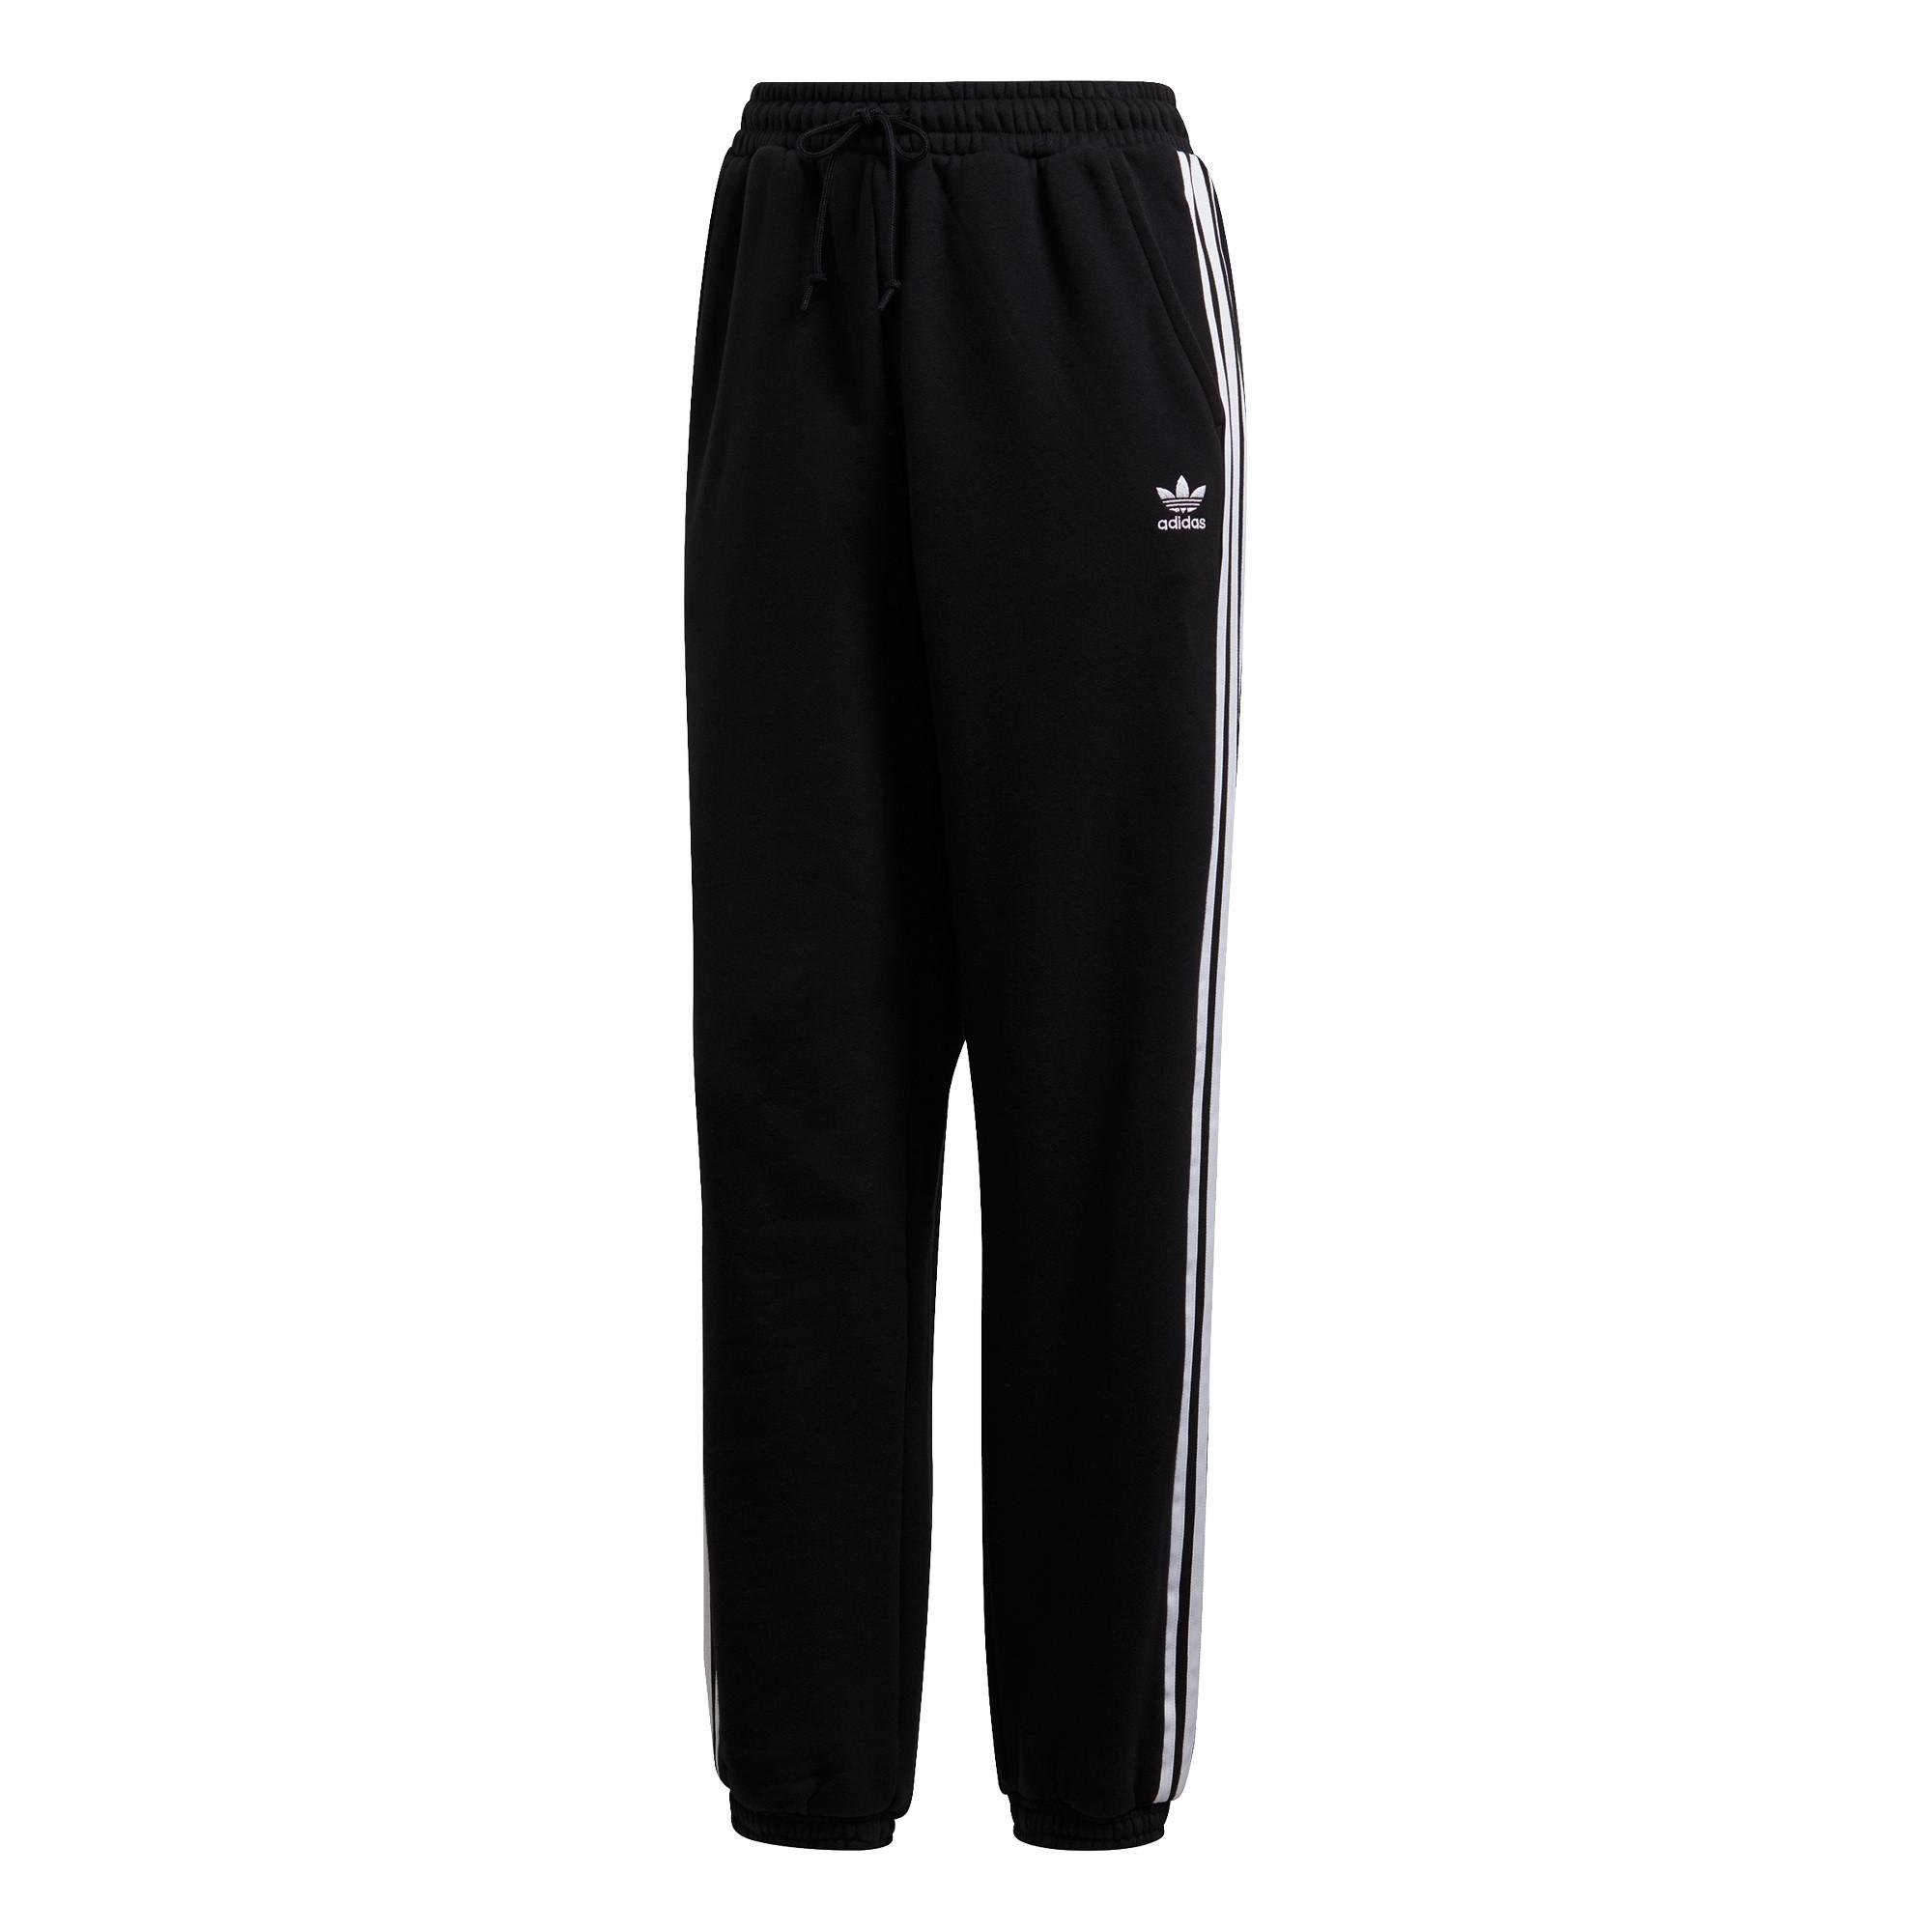 Pantaloni tuta Regular Jogger, Nero, large image number 0